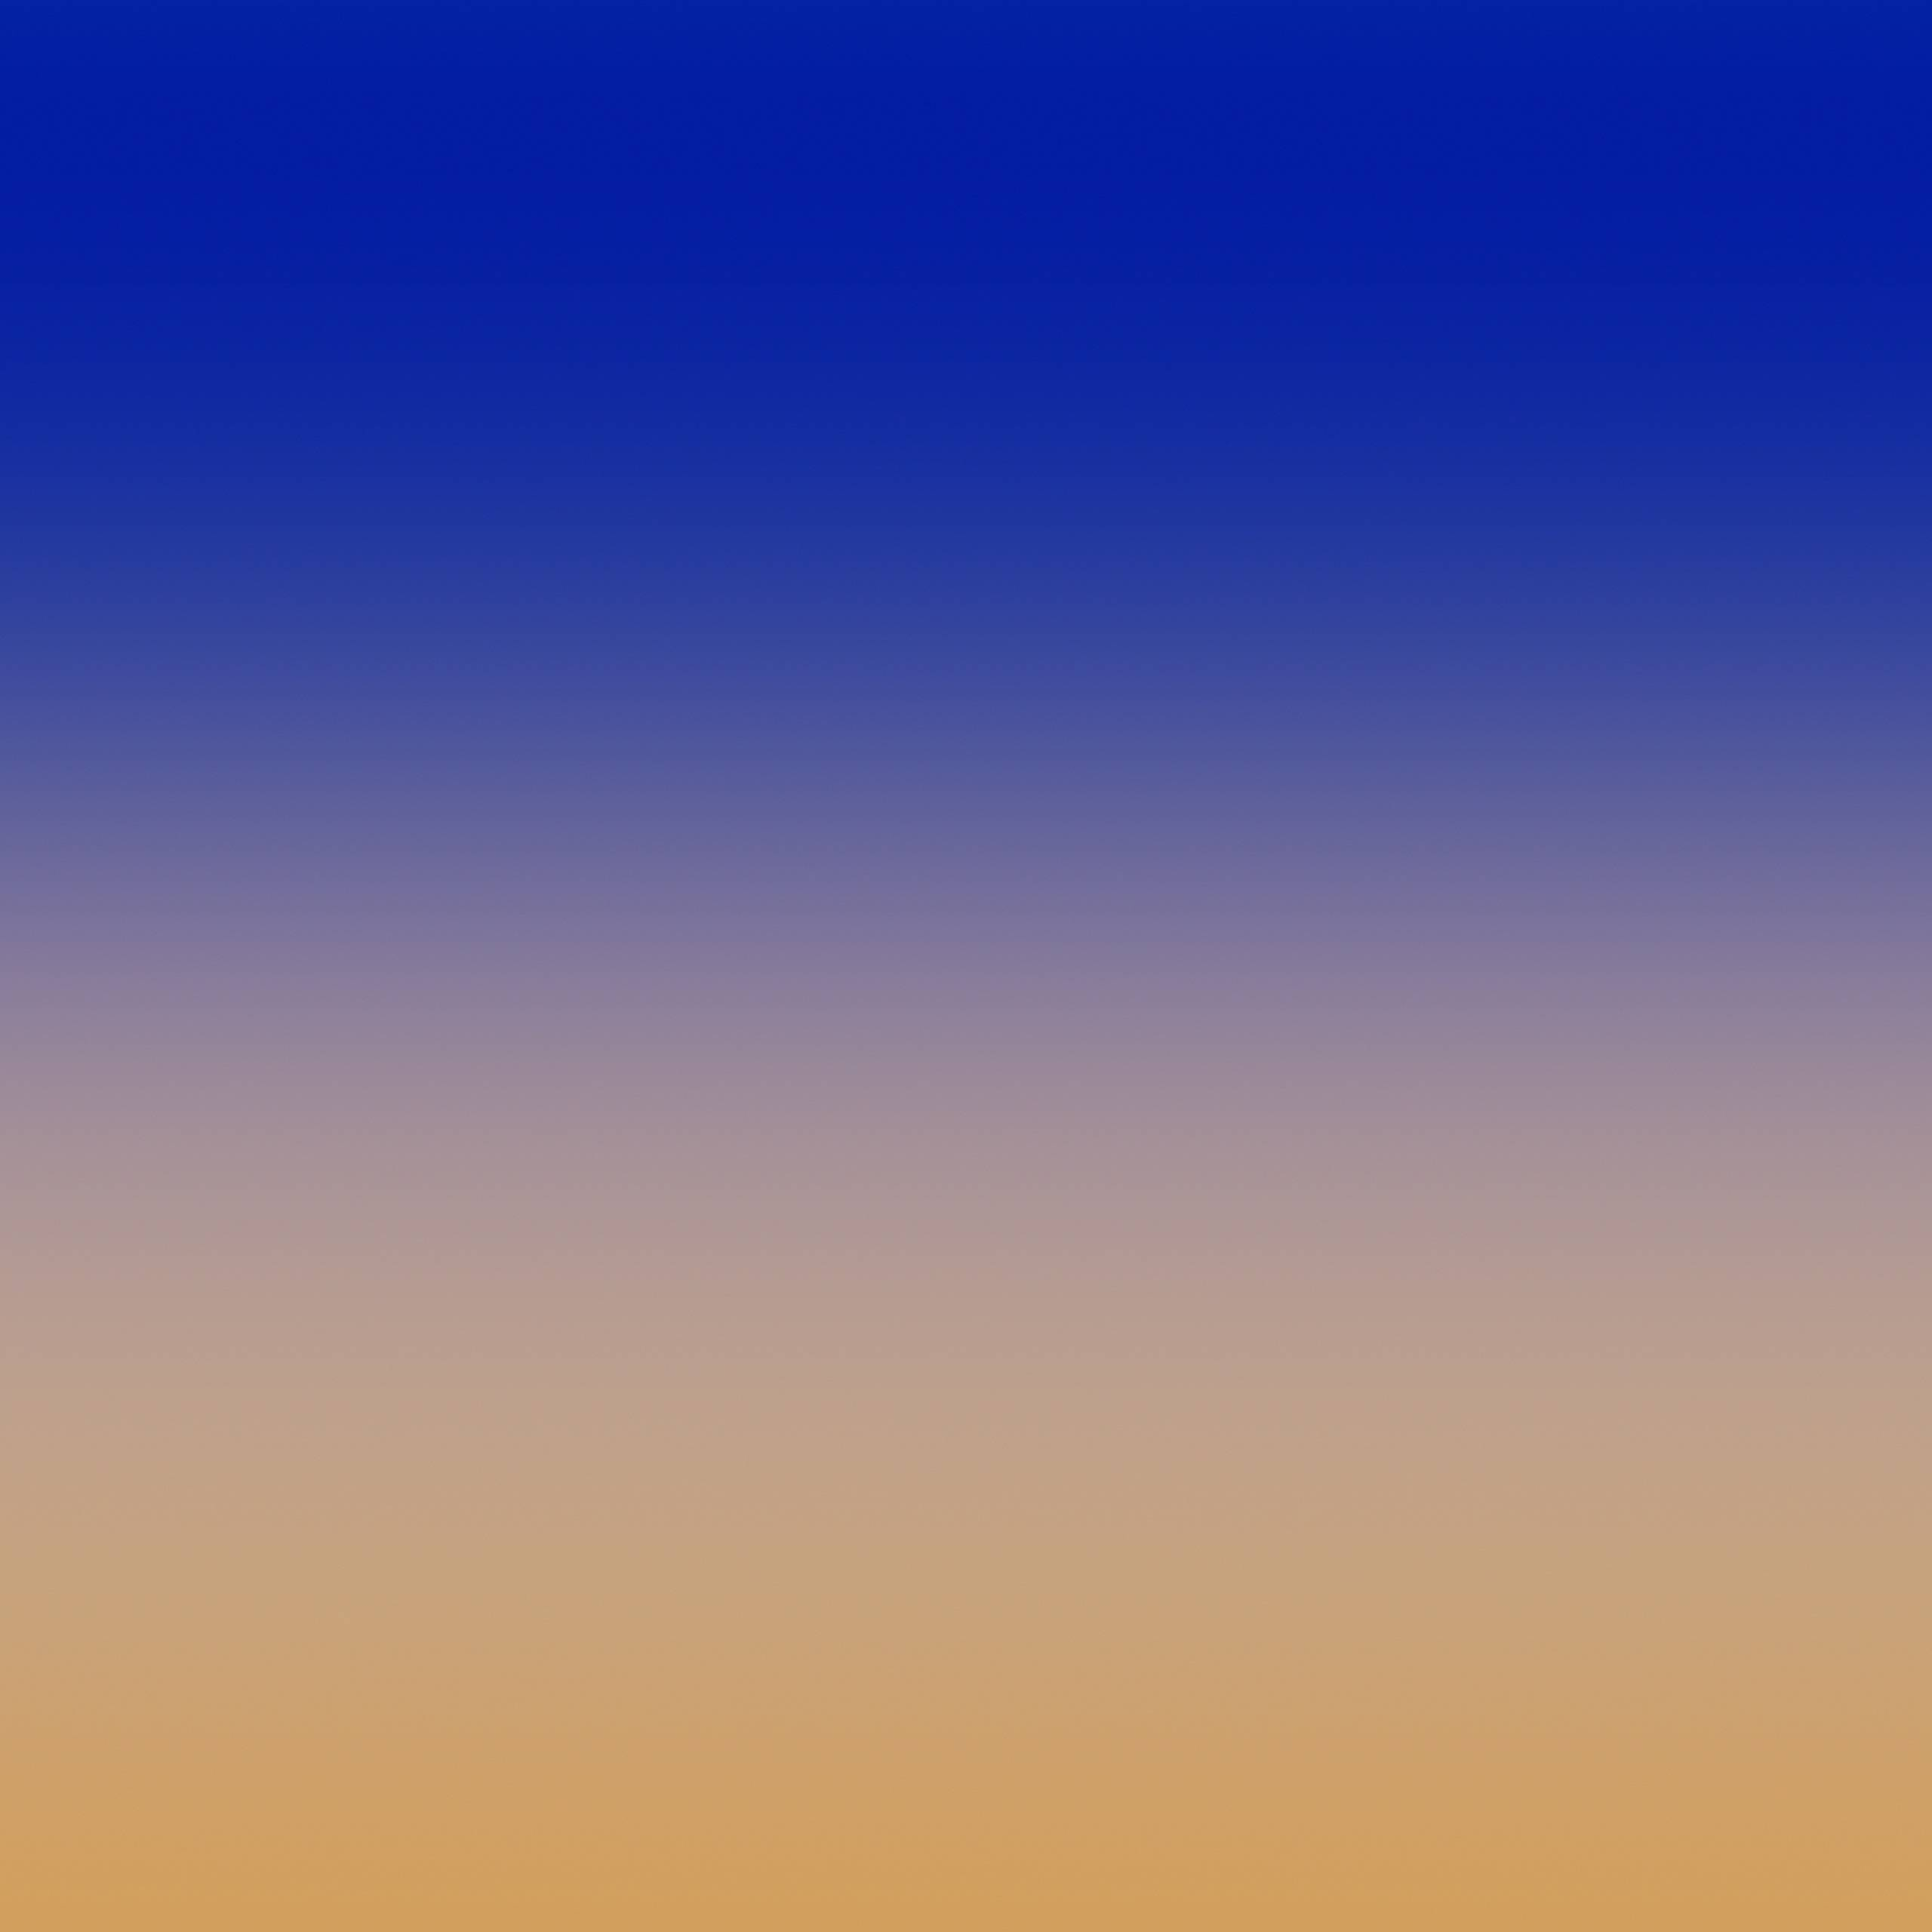 Samsung Galaxy Note 9 Stock Wallpaper 02 - [2560x2560]